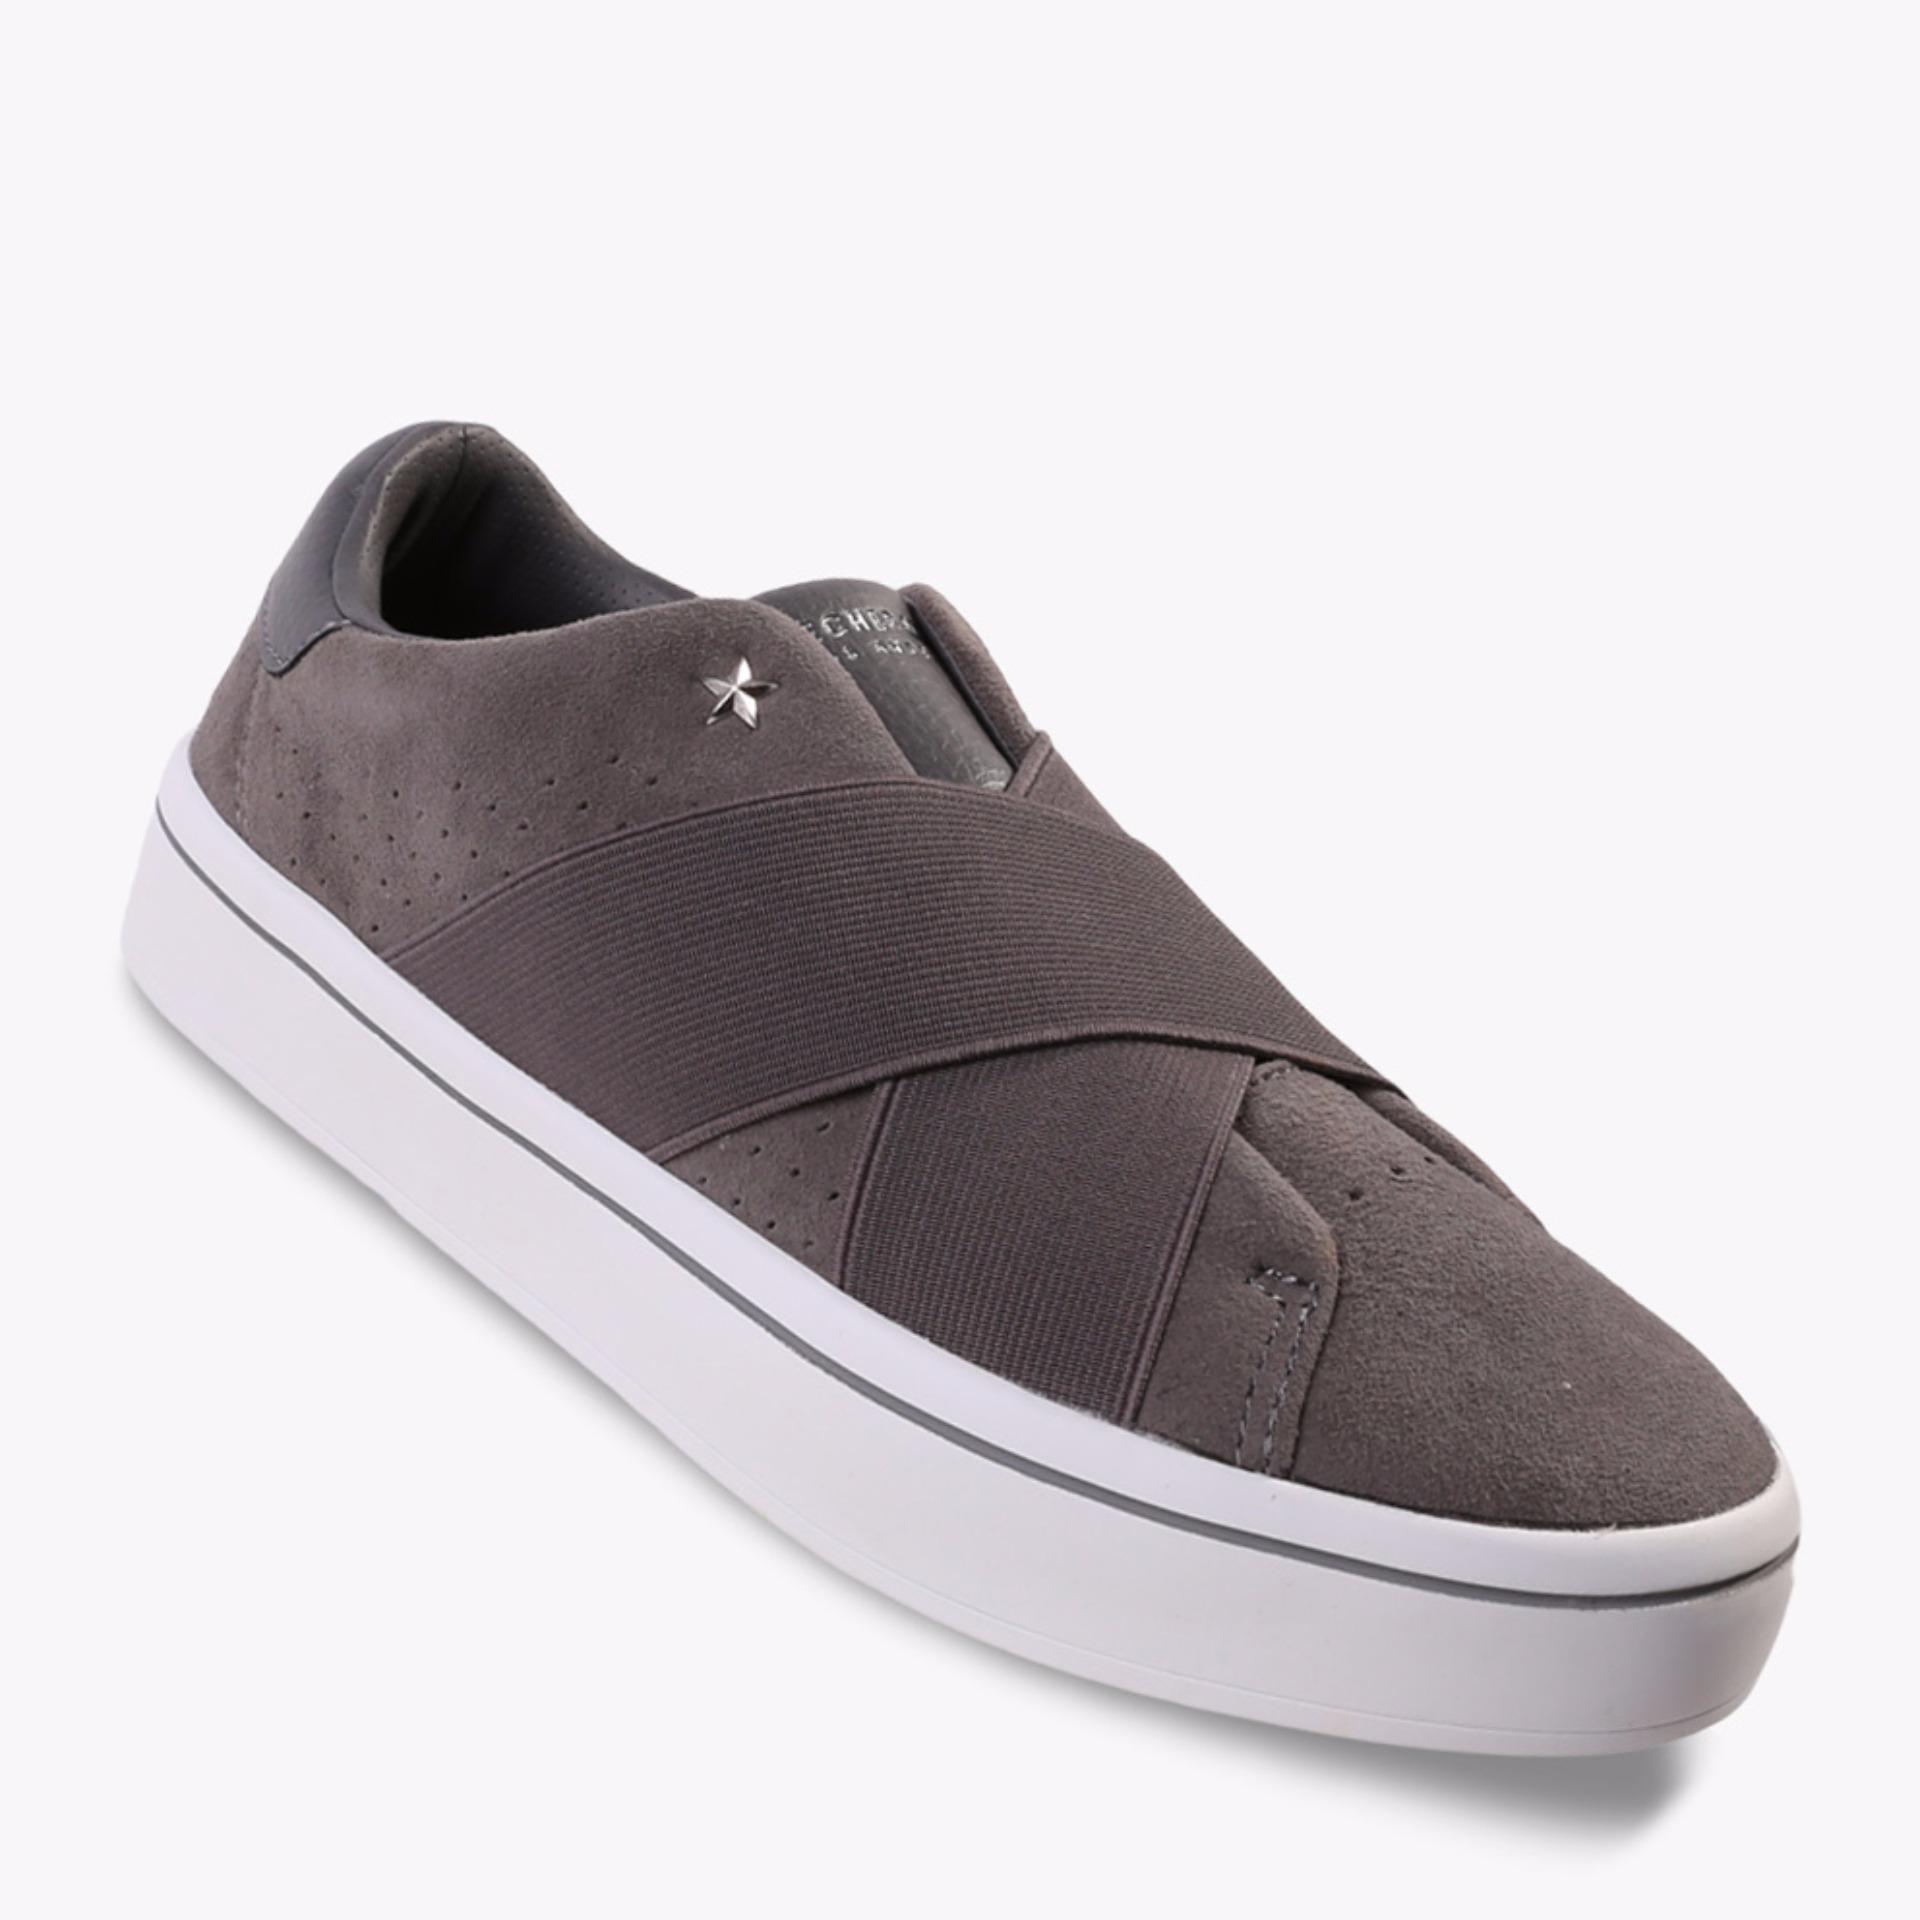 Harga Hemat Skechers Hi Lites Street Crossers Women S Sneakers Shoes Abu Abu